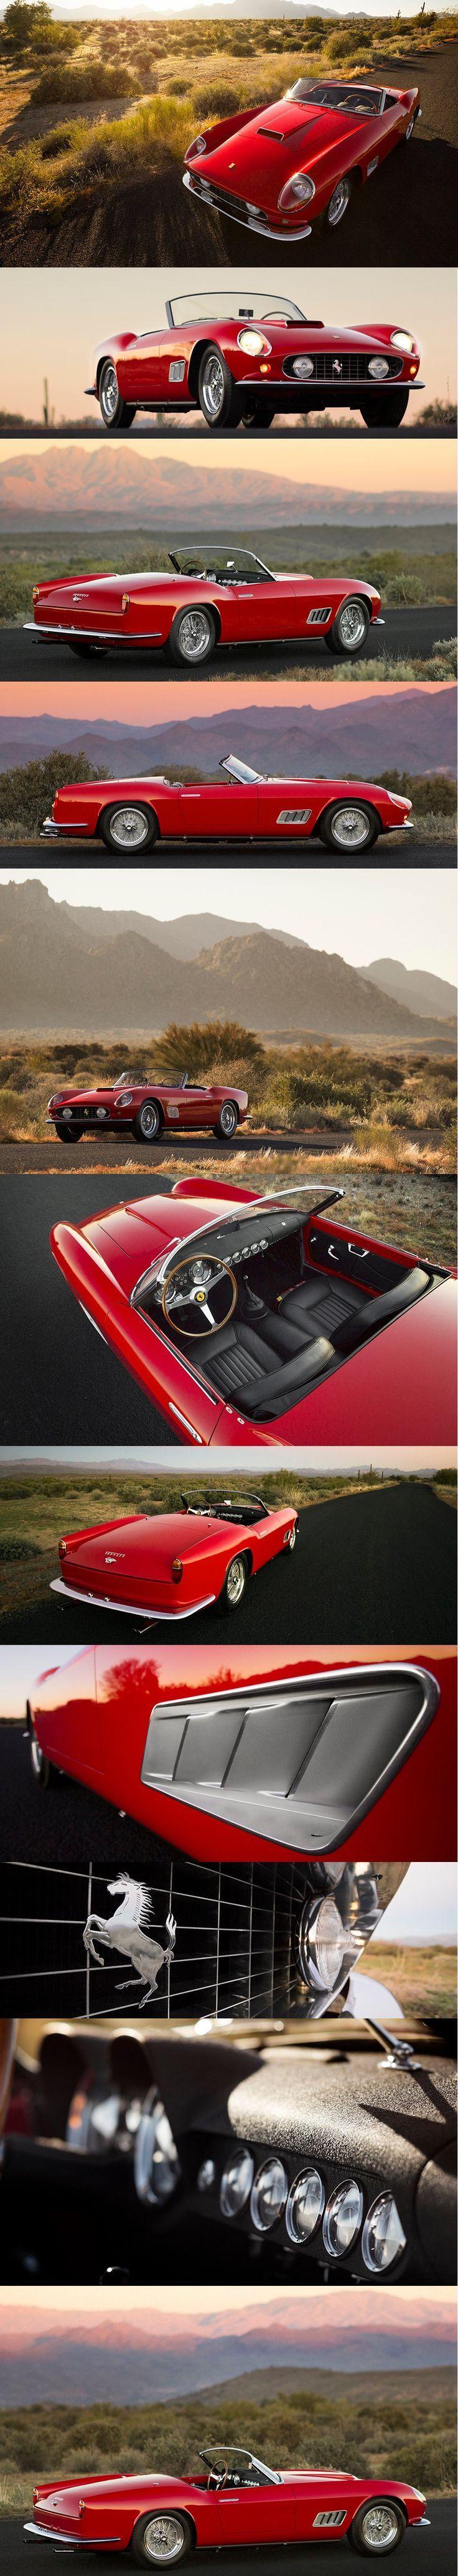 babdc4695811c773d04b18b675c0fa94 Breathtaking Ferrari Mondial T Cabrio Kaufen Cars Trend